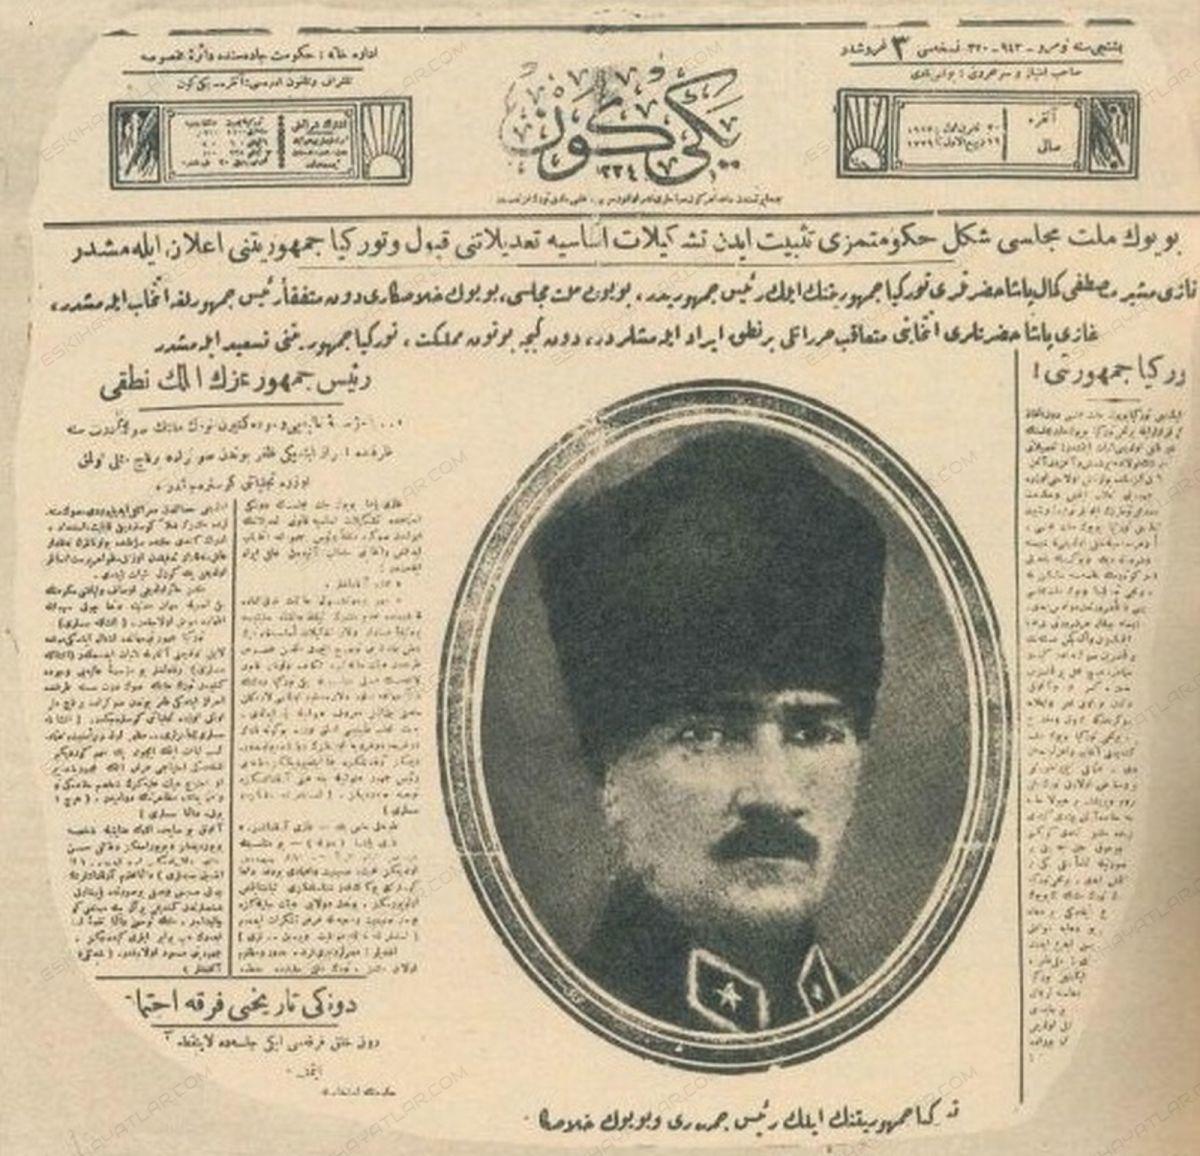 0450-cumhuriyet-nasil-kuruldu-1973-hayat-dergisi-mustafa-kemal-ataturk-posterleri (6)